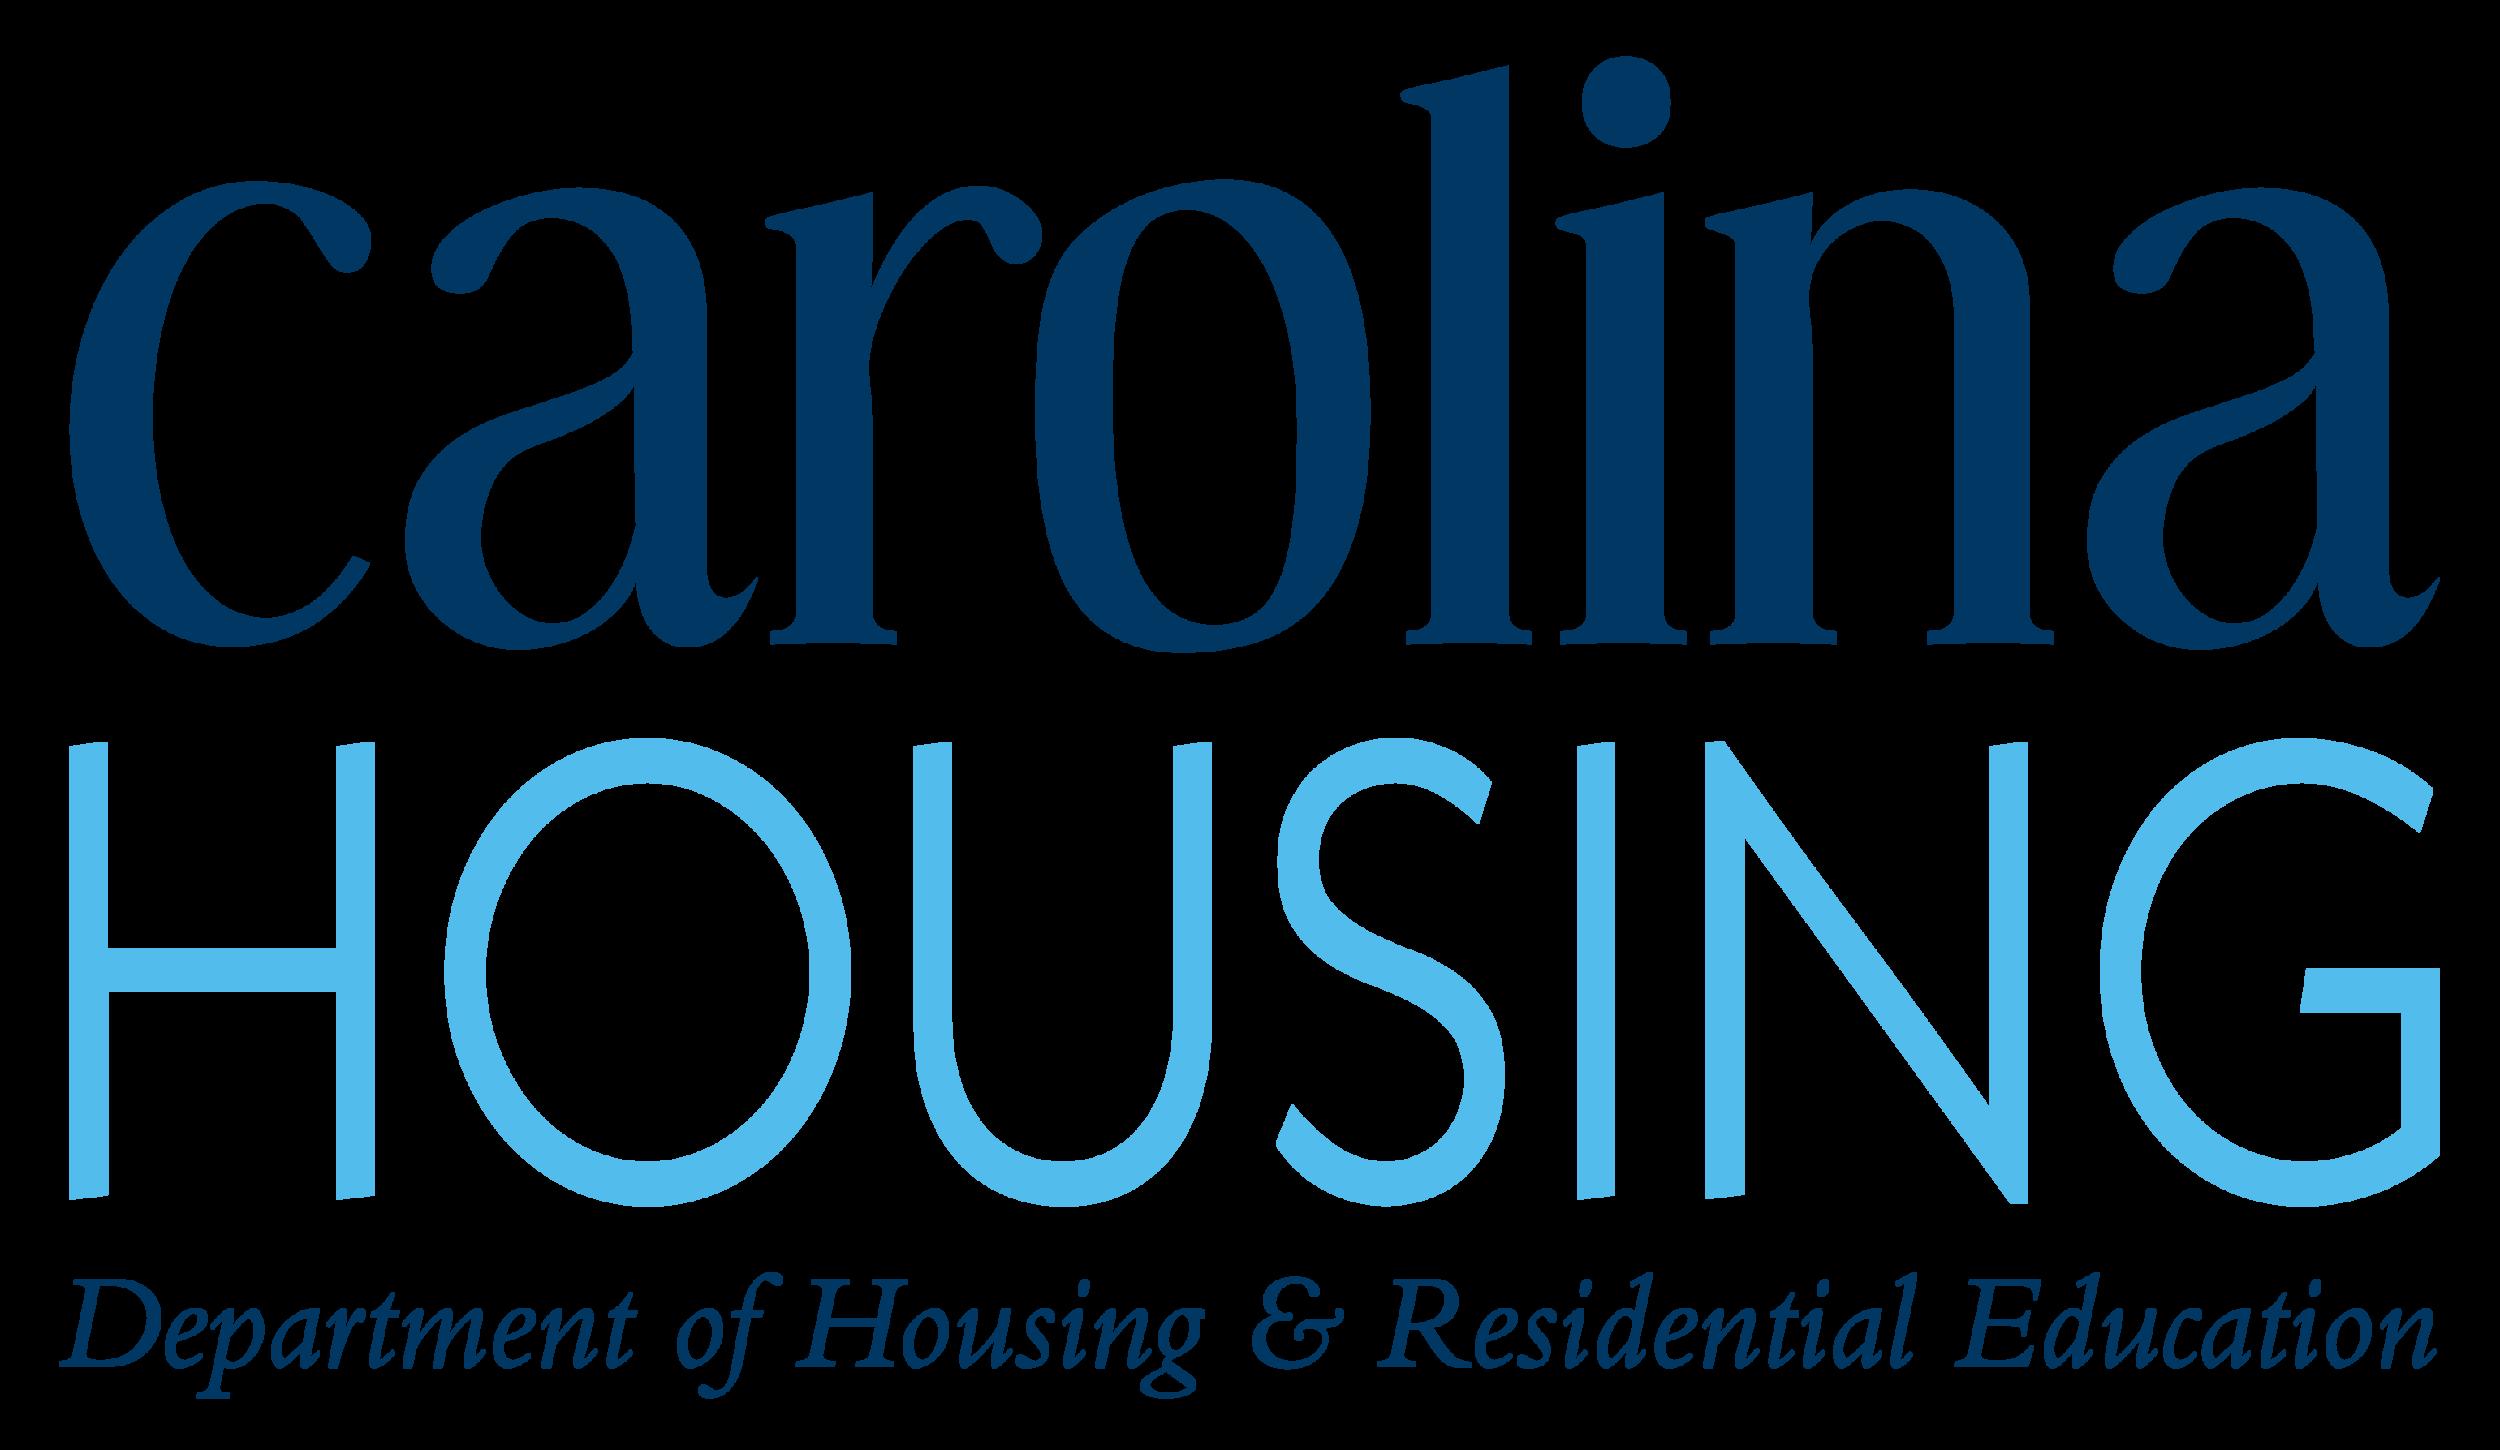 Carolina_Housing_Logo_navyblue3994.png